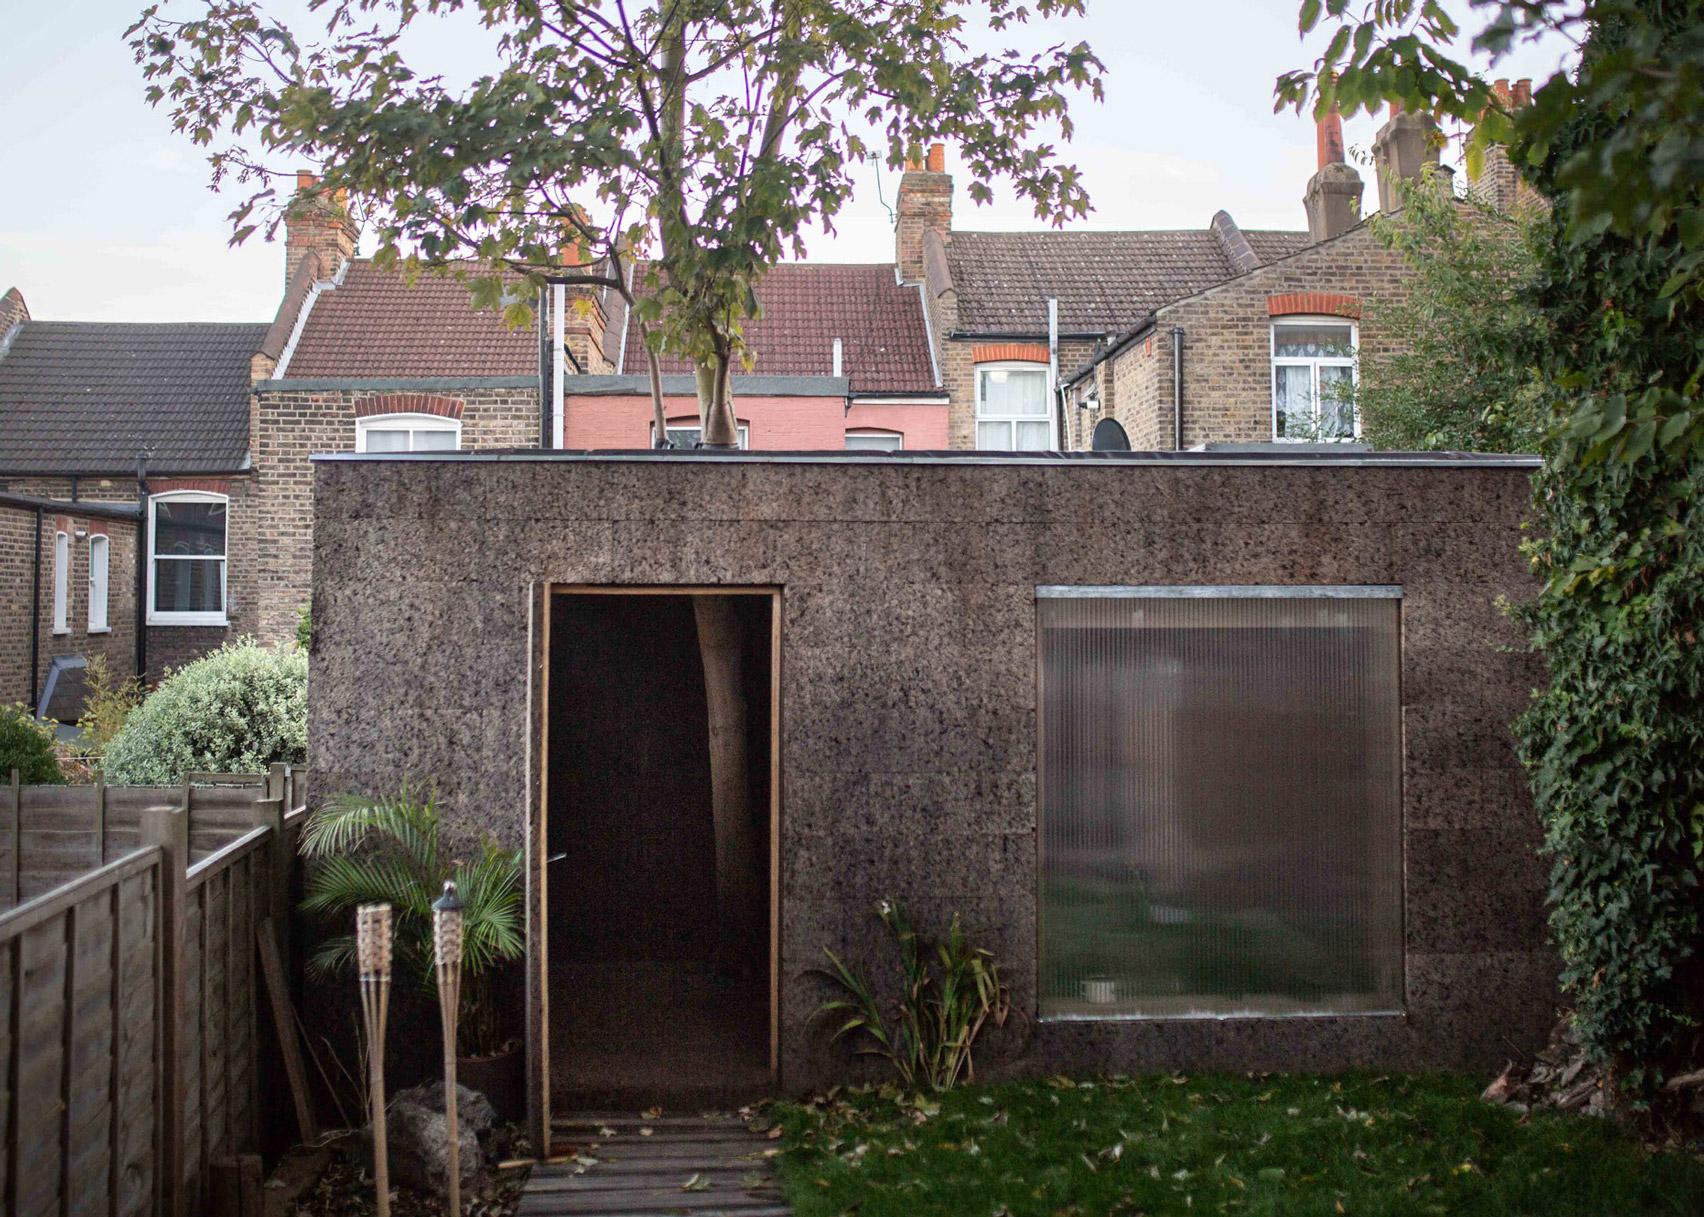 The Cork Studio by Studio Bark